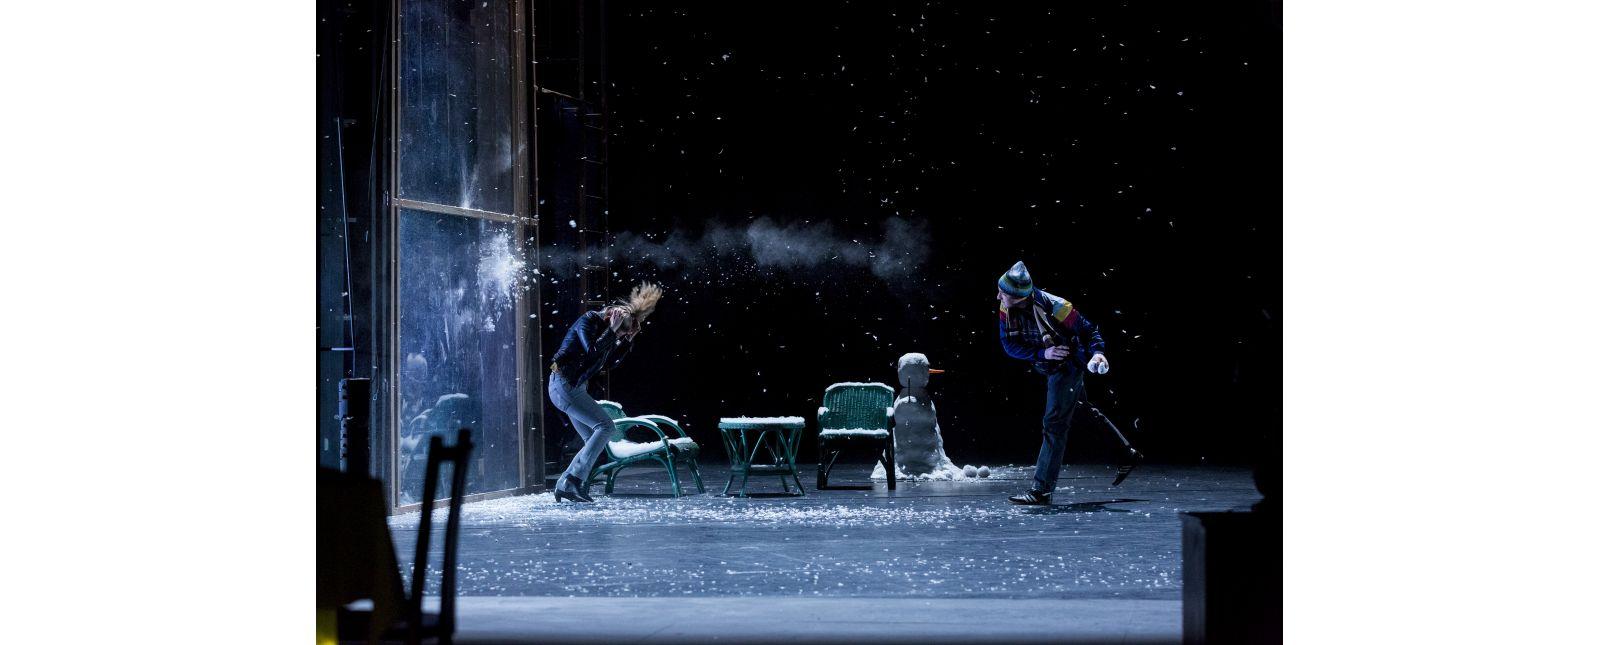 Drei Winter // Marieke Kregel, Tim Al-Windawe // Rainer Muranyi // 2018